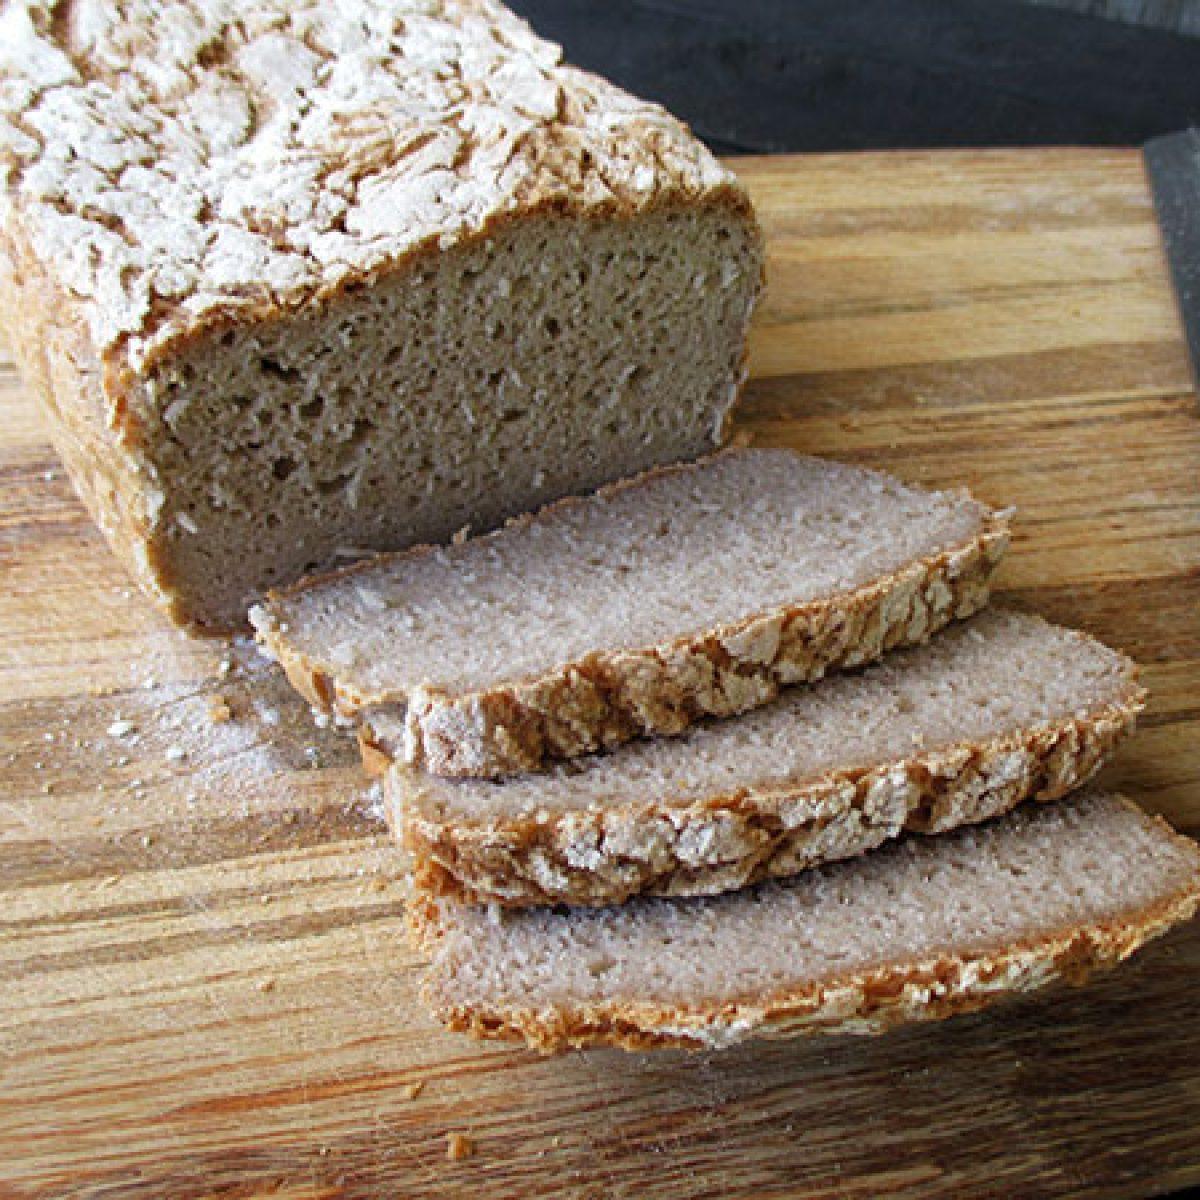 05_Vegan_Glutenfree_Super_Easy_Buckwheat_Bread_Recipe-Veganes_Glutenfreies_Einfaches_Buchweizen_Brot_Rezept